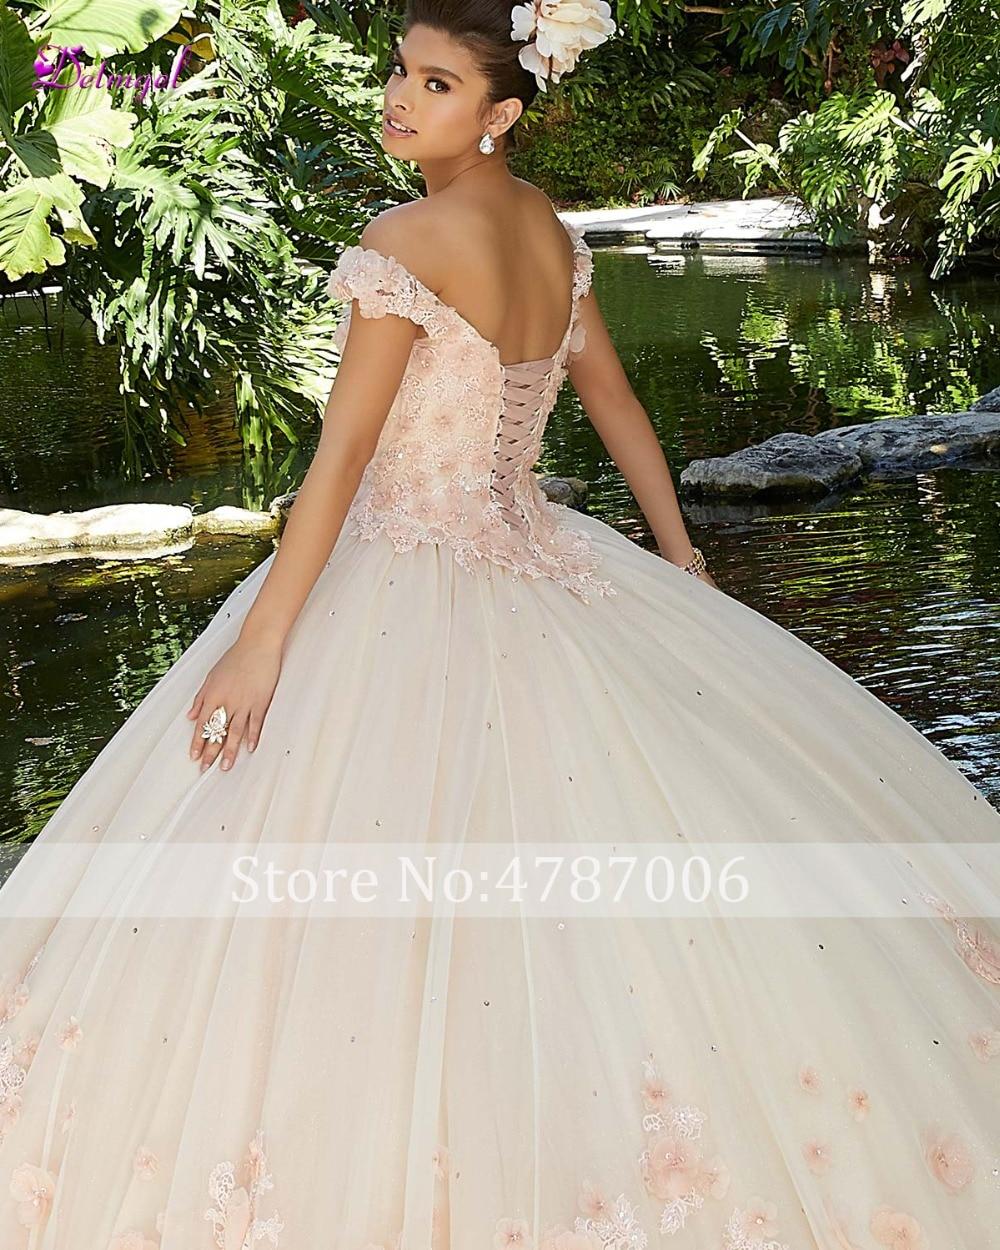 Detmgel Sexy bateau cou perlé fleurs robe de bal Quinceanera robes 2019 de luxe Appliques Debutante robe pour Vestido de 15 anos - 6